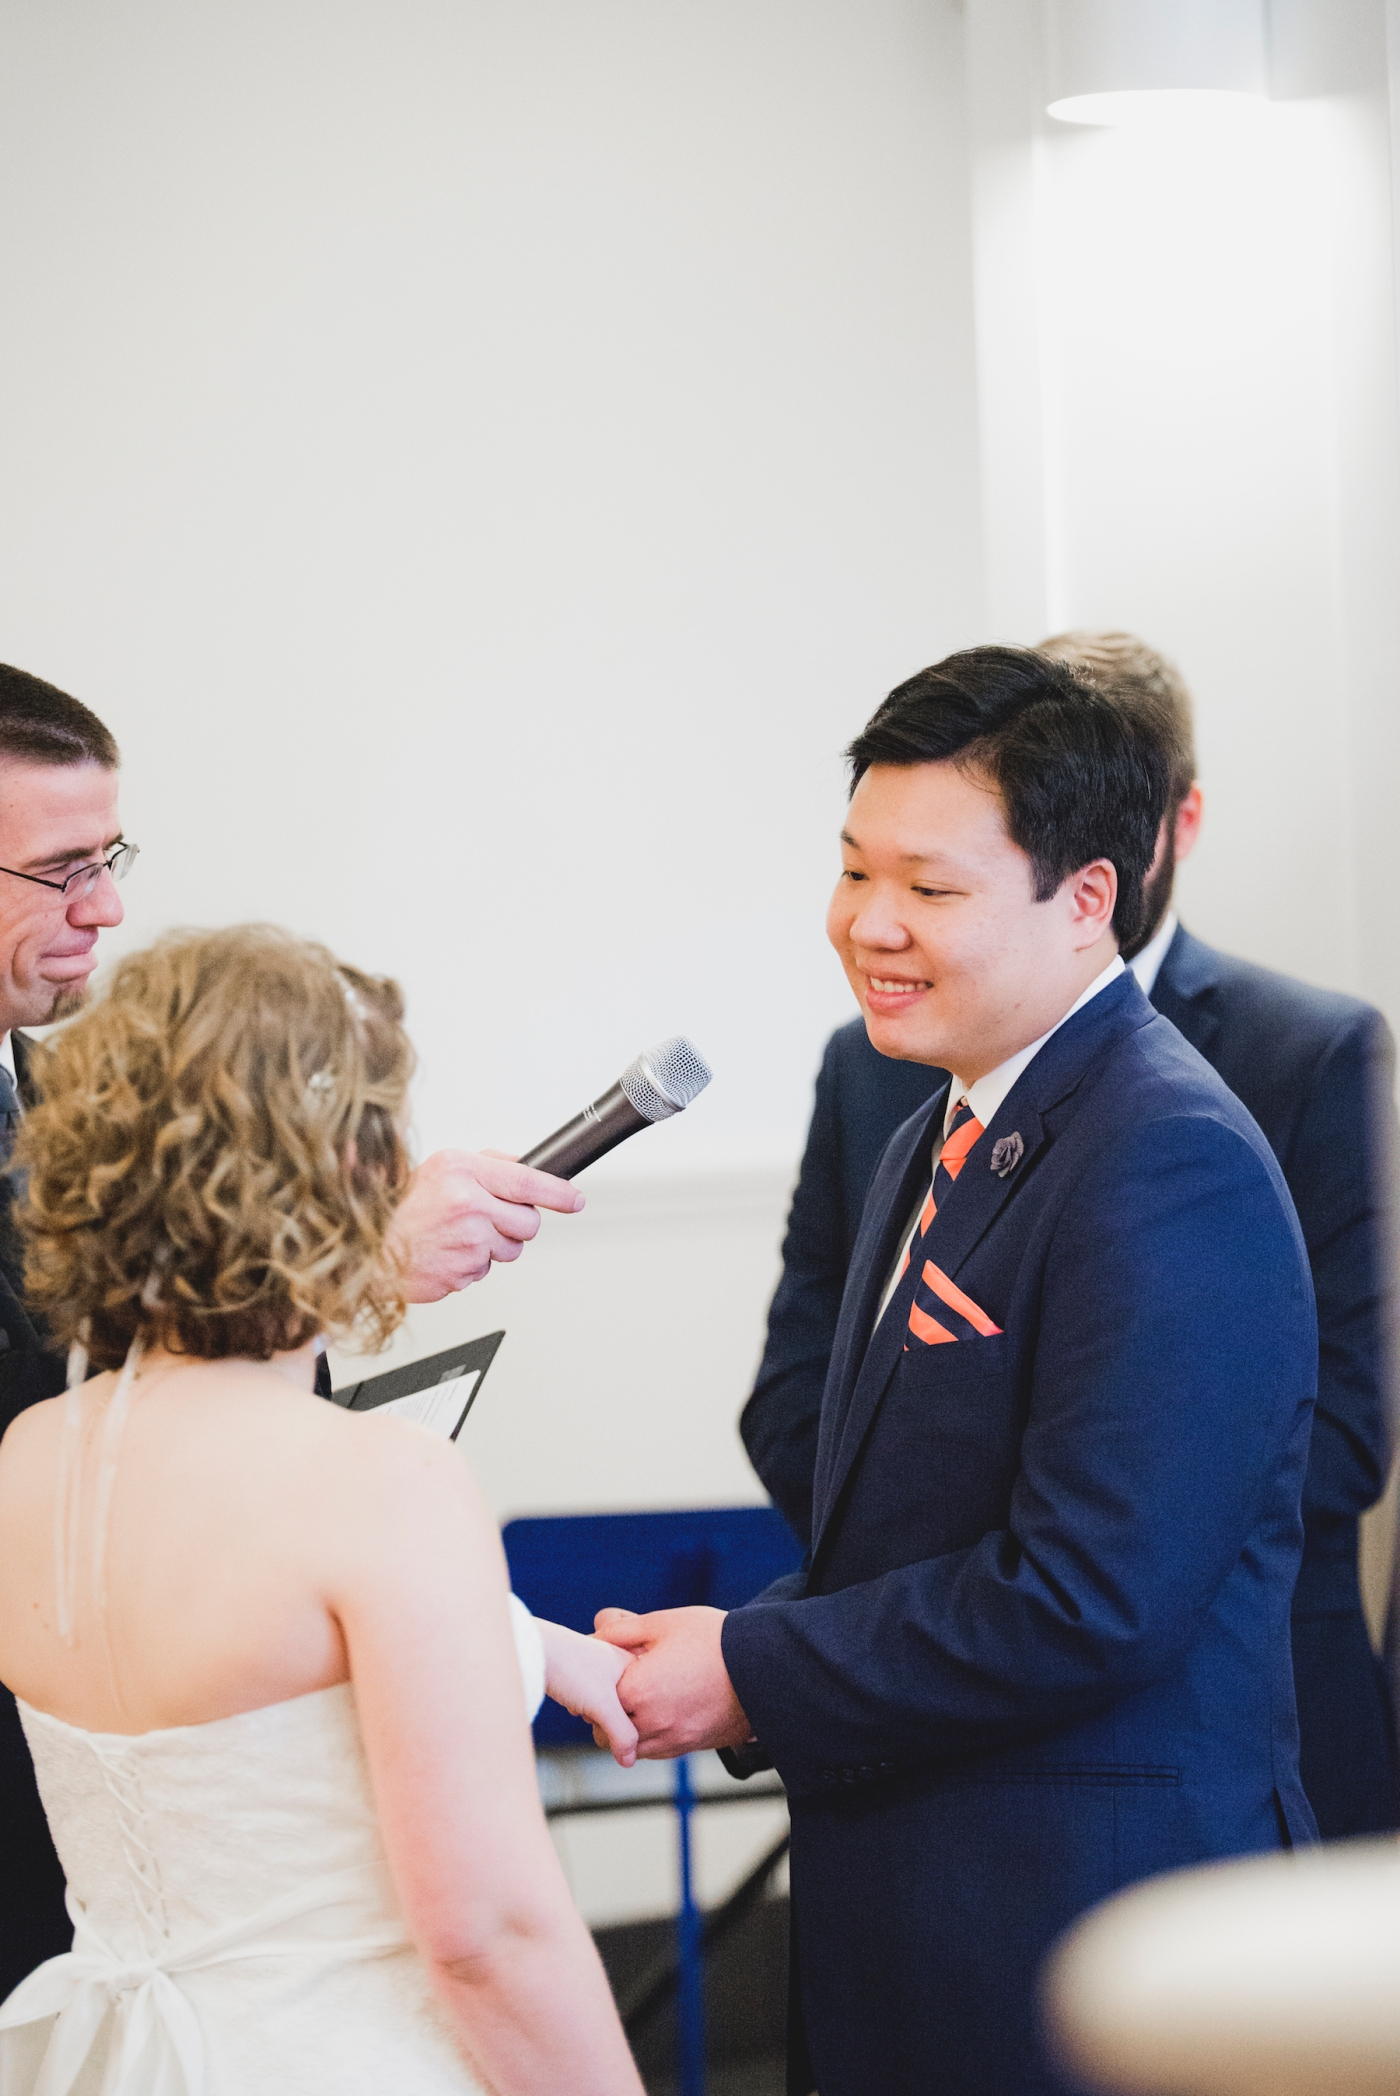 DSC_2688Everett_Wedding_Ballroom_Jane_Speleers_photography_Rachel_and_Edmund_Ceremony_2017